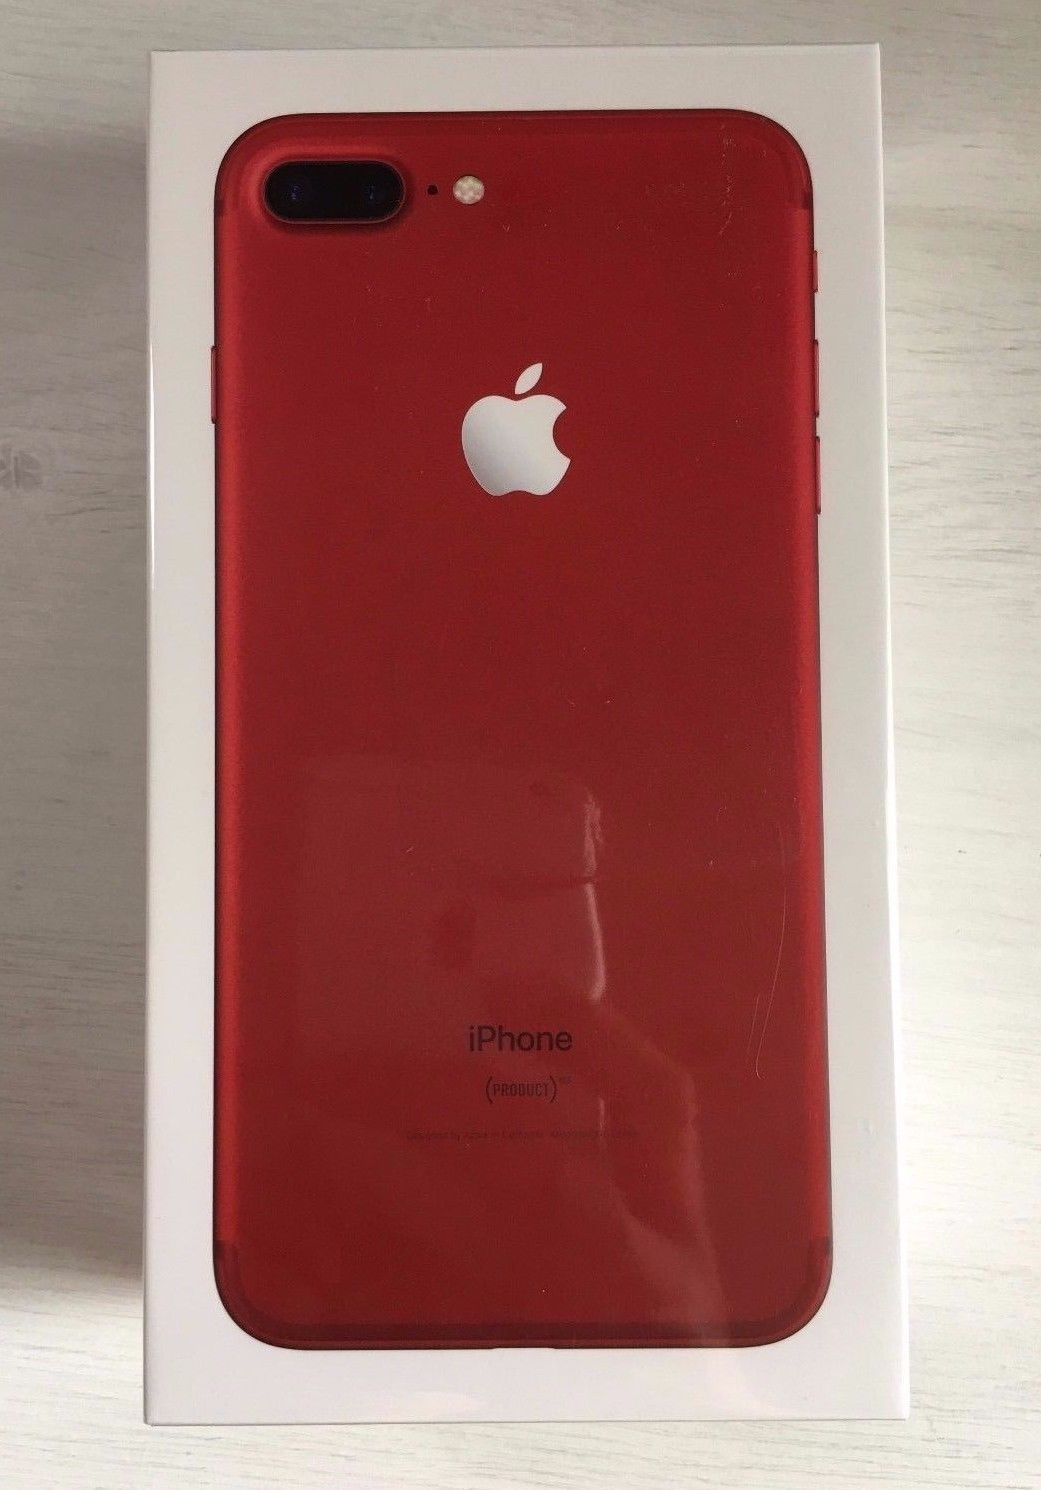 Apple iphone 7 plus 256 gb product red unlocked